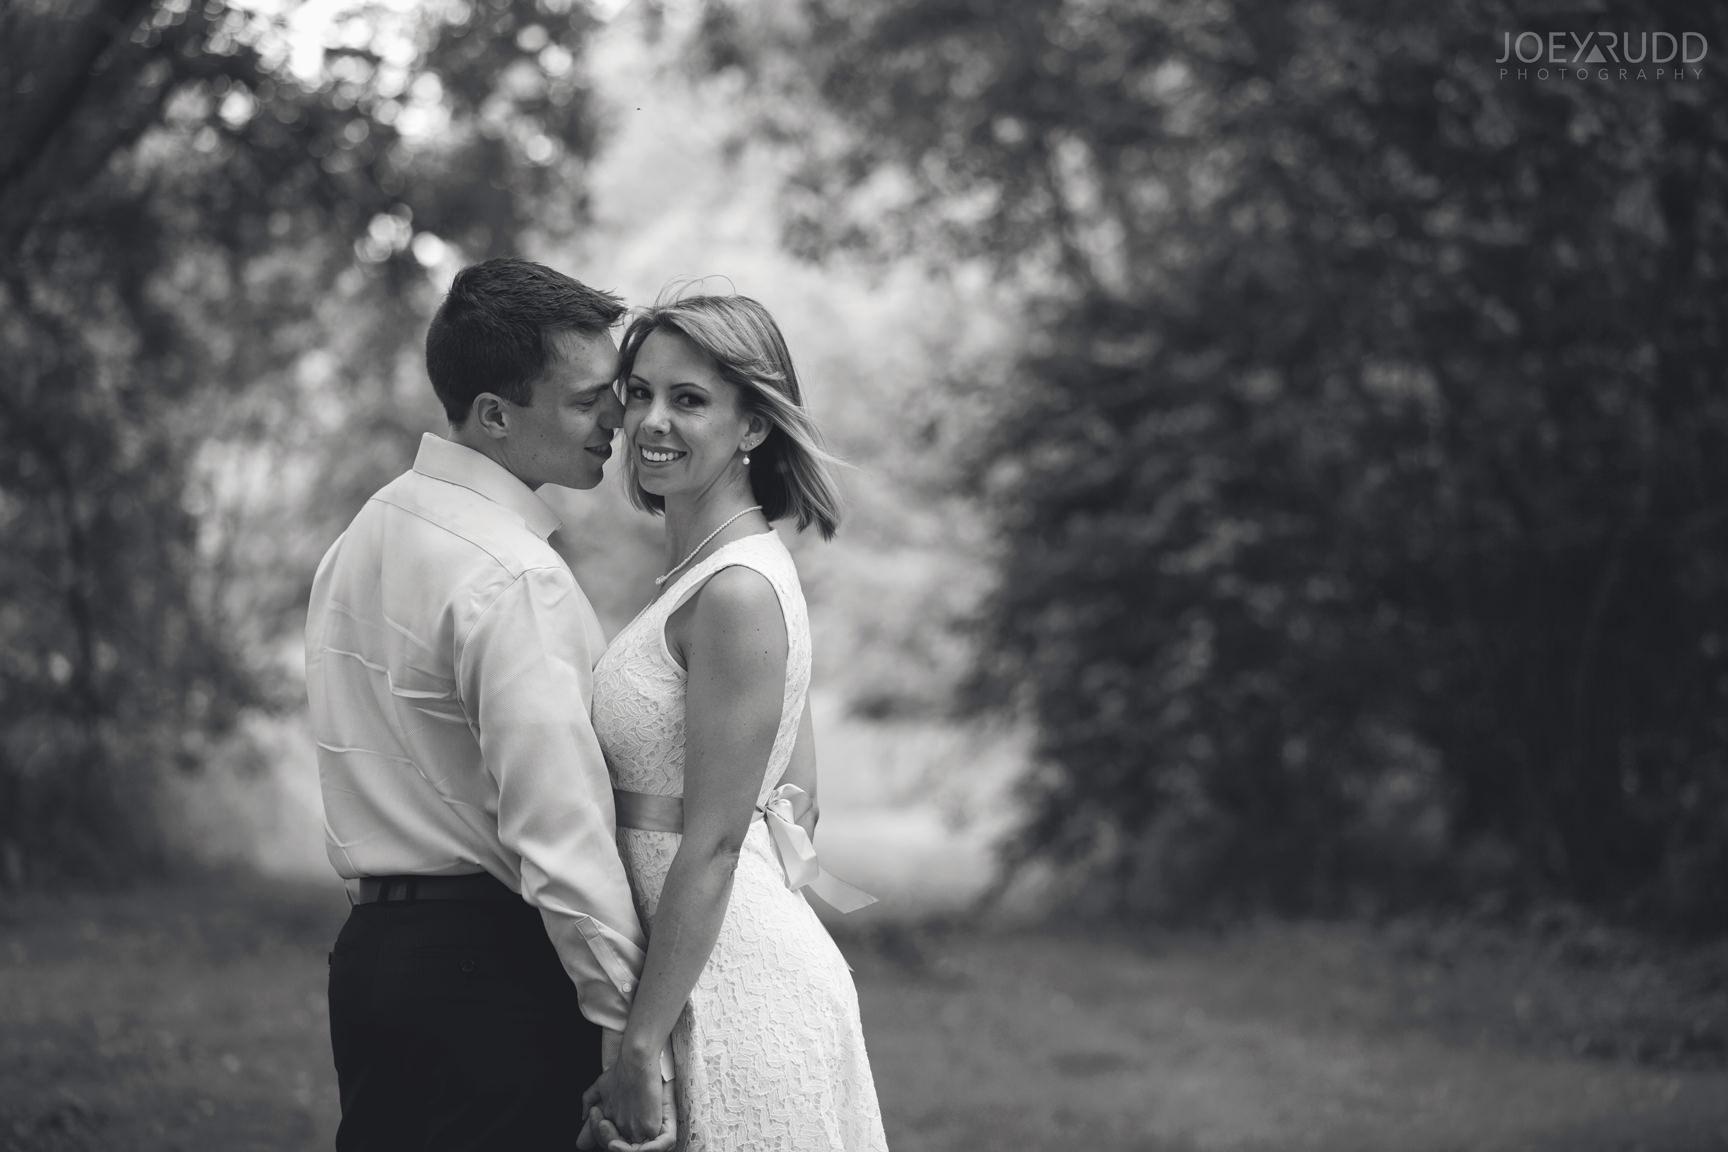 Elopement Wedding Ottawa Photographer Elope Photography Joey Rudd Photographer Richmond Ontario